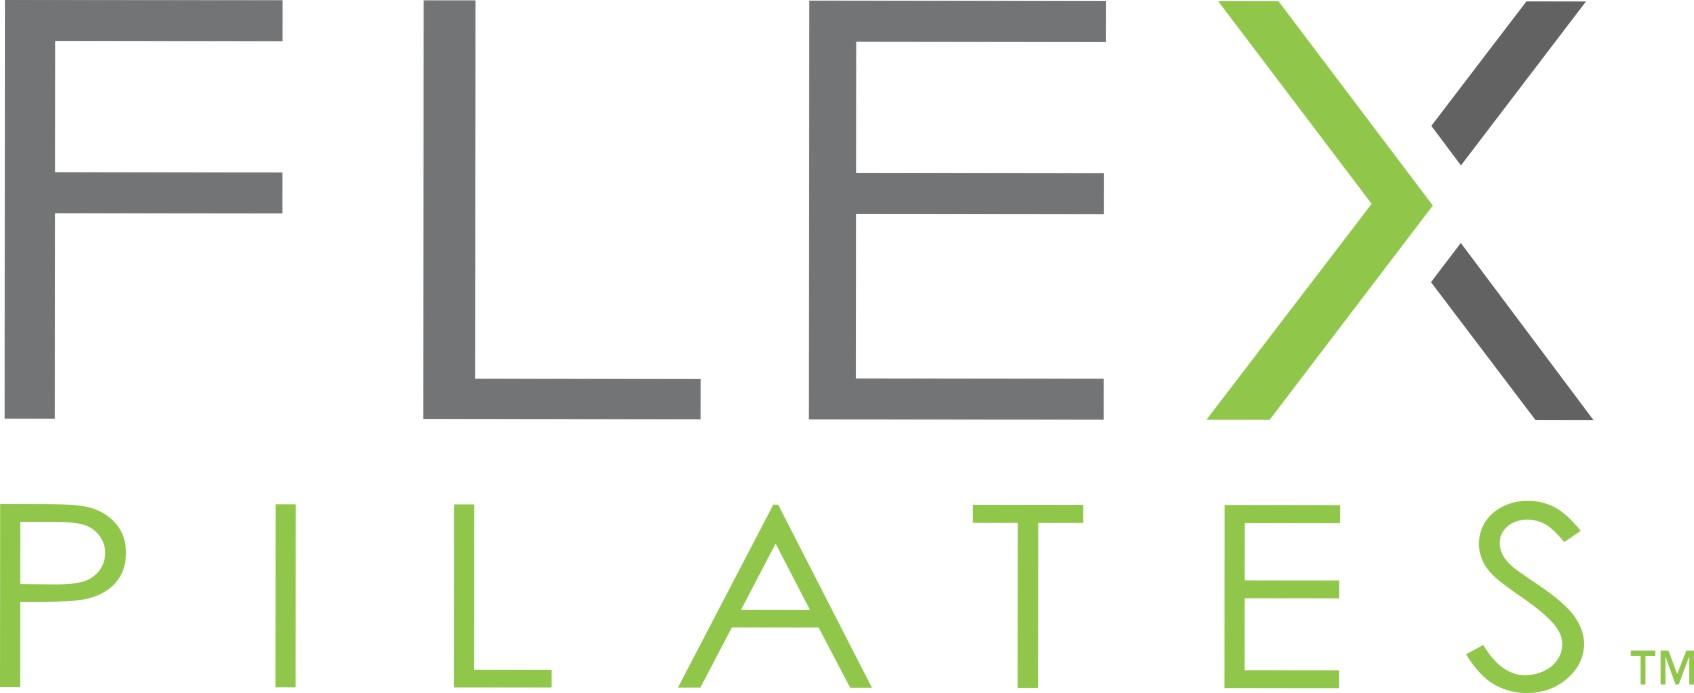 Flex_logos_MASTER_FLEX_Pilates_wordmark.jpg